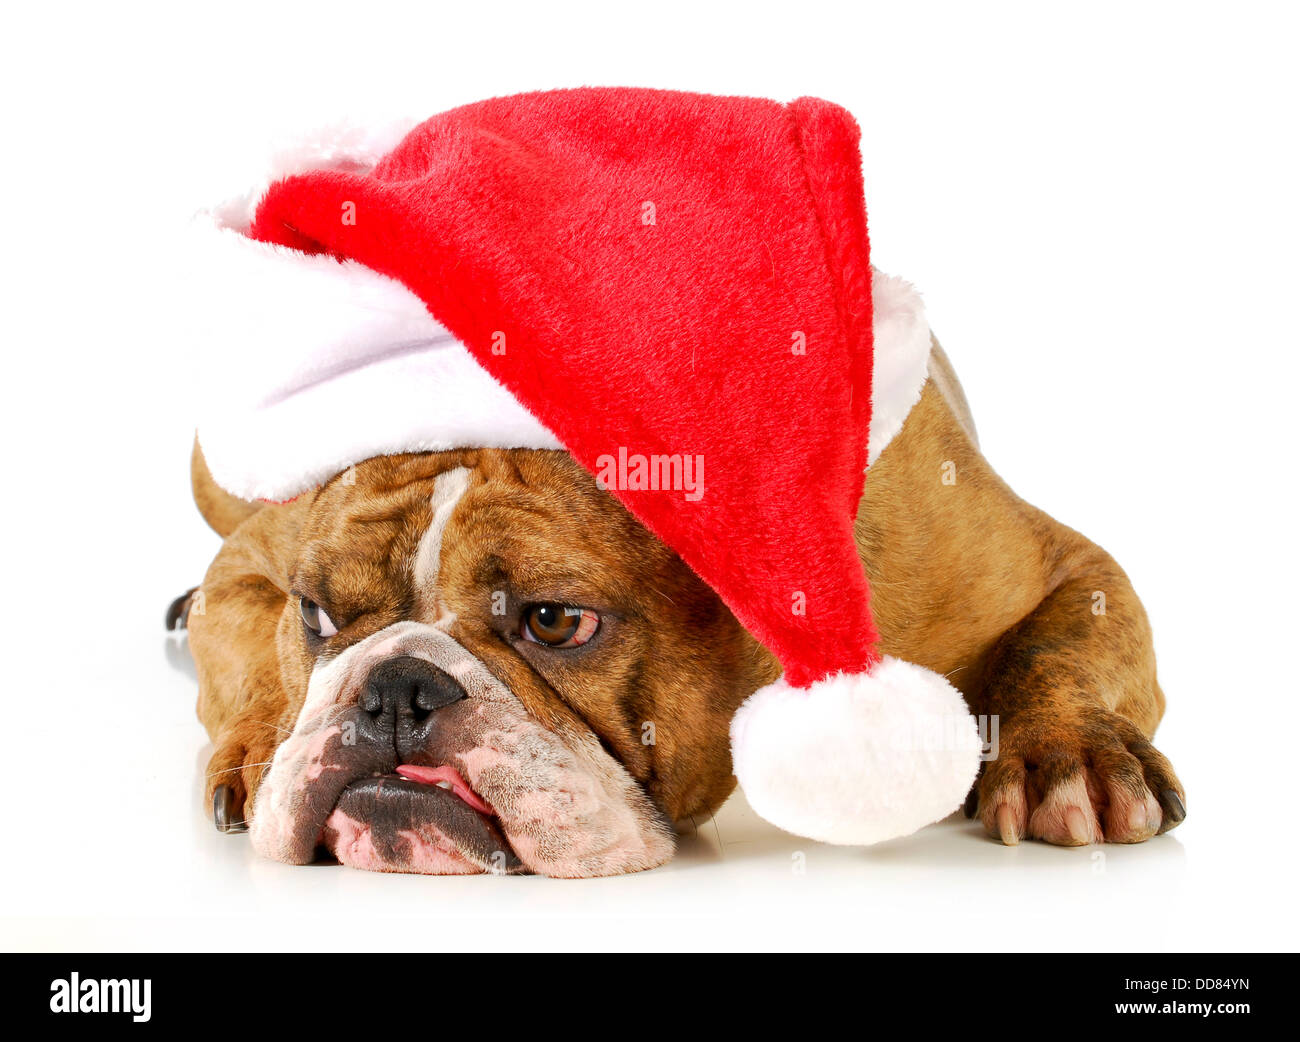 bulldog wearing santa hat stockfotos bulldog wearing santa hat bilder alamy. Black Bedroom Furniture Sets. Home Design Ideas